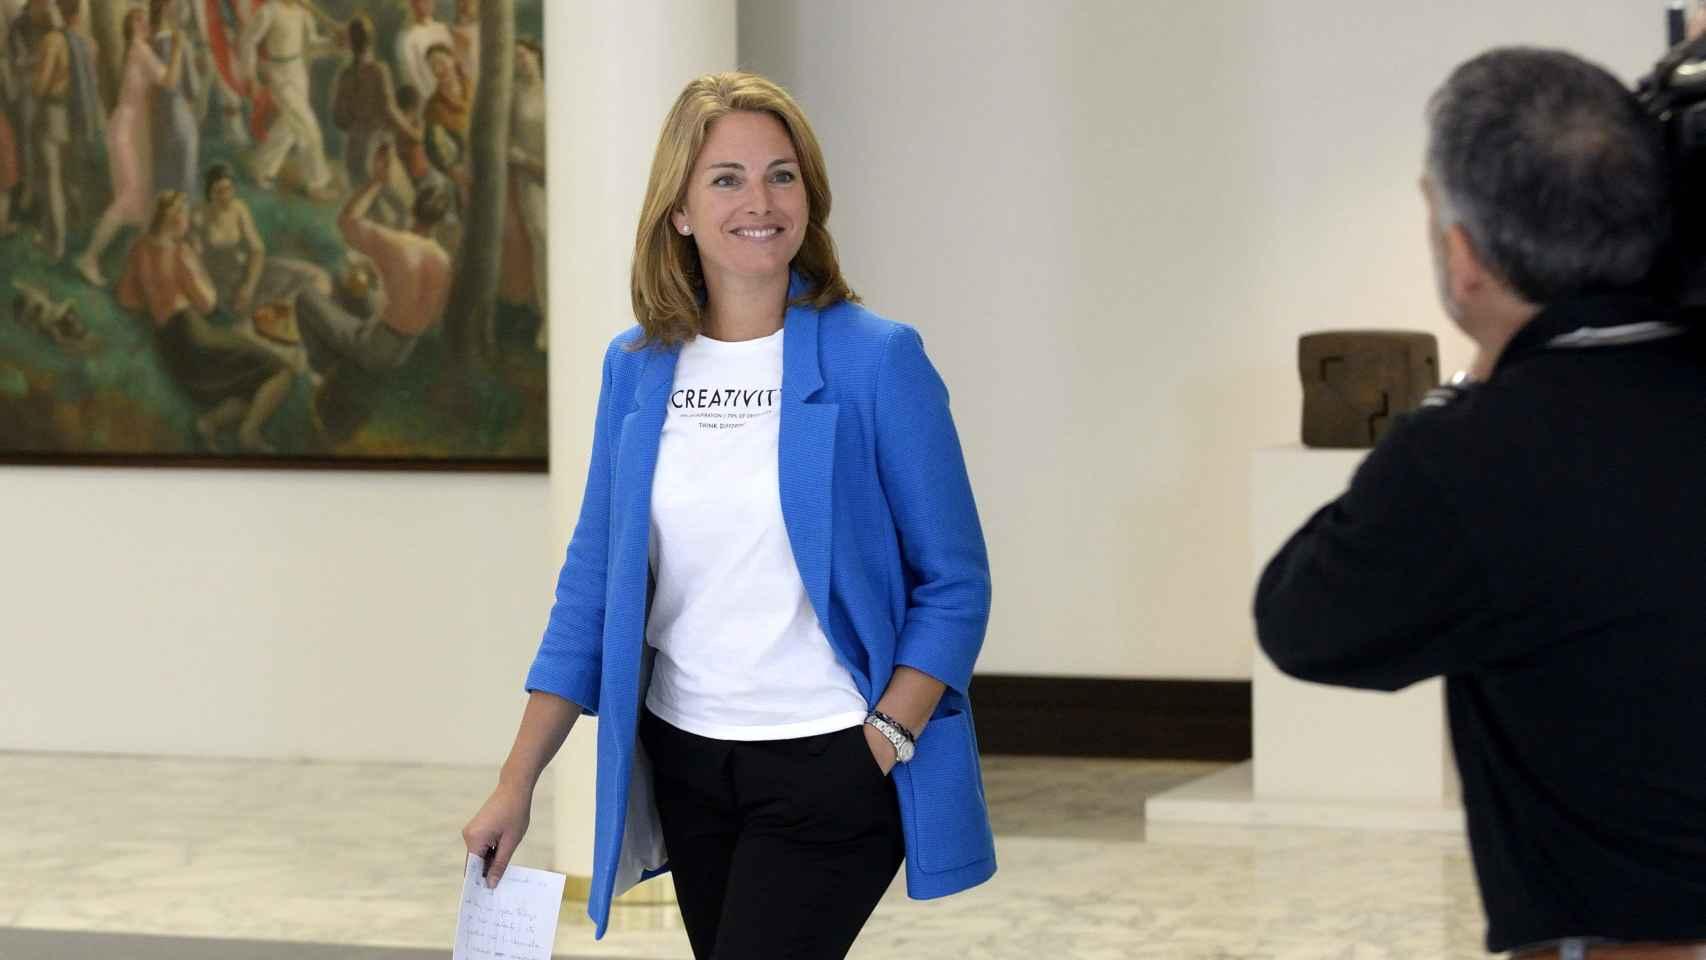 La líder del PP vasco, Arantza Quiroga, sigue sin dar señales de vida.